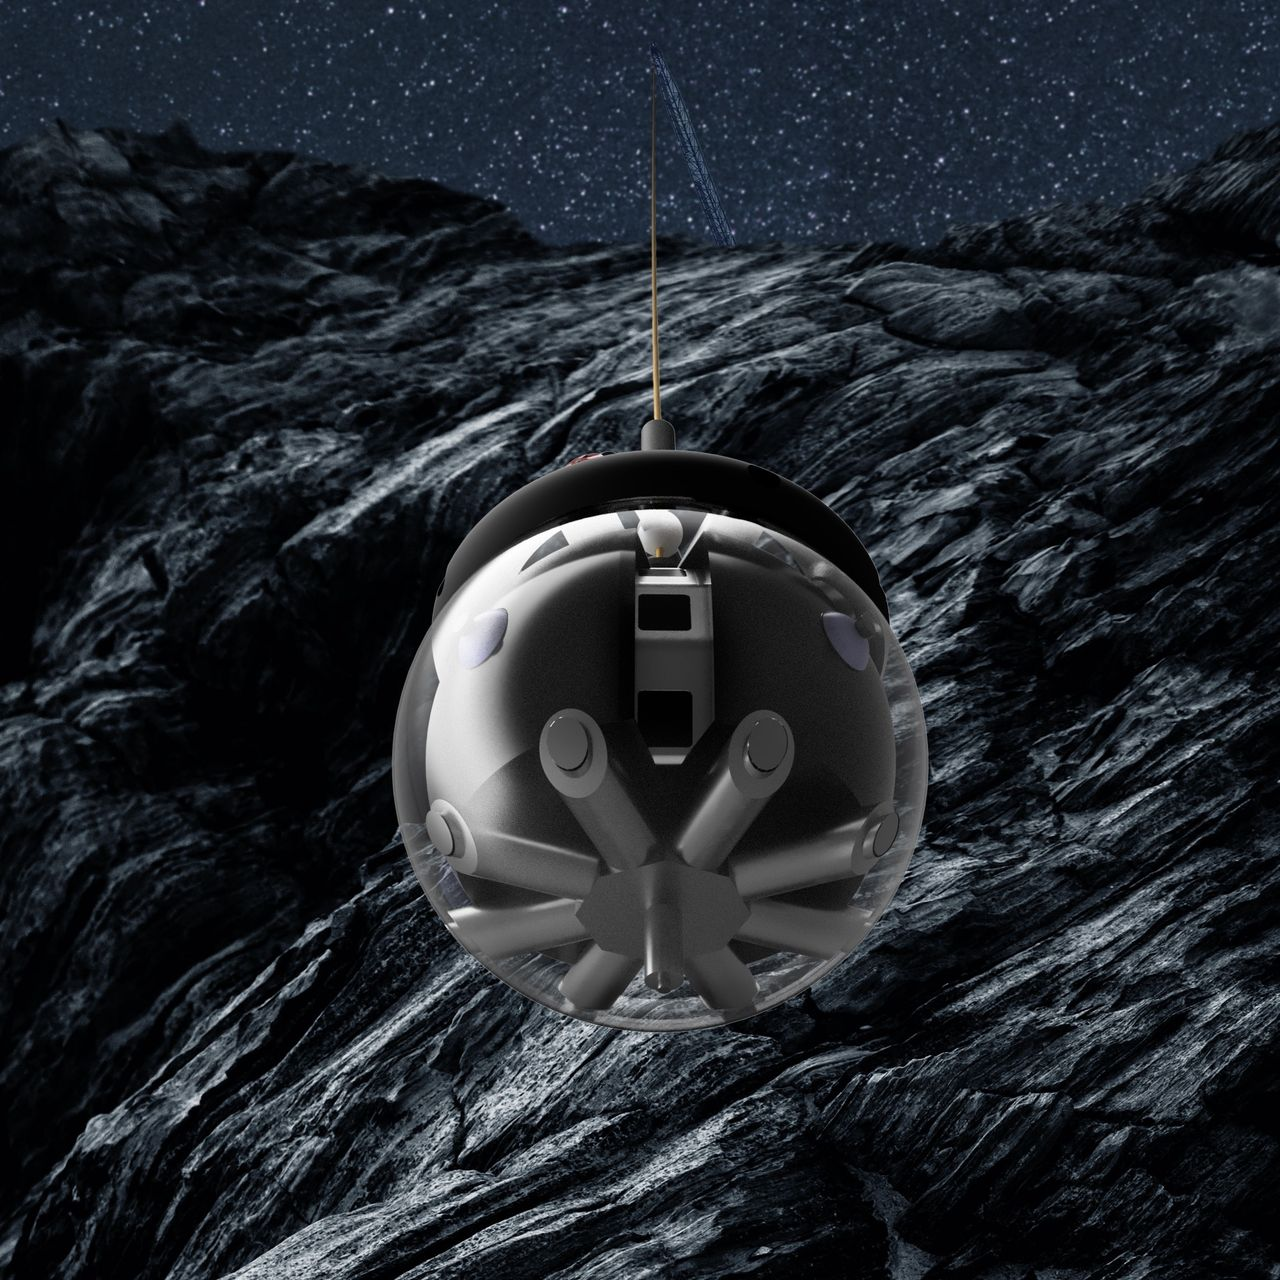 Roboten Daedalus kan utforska grottor på månen